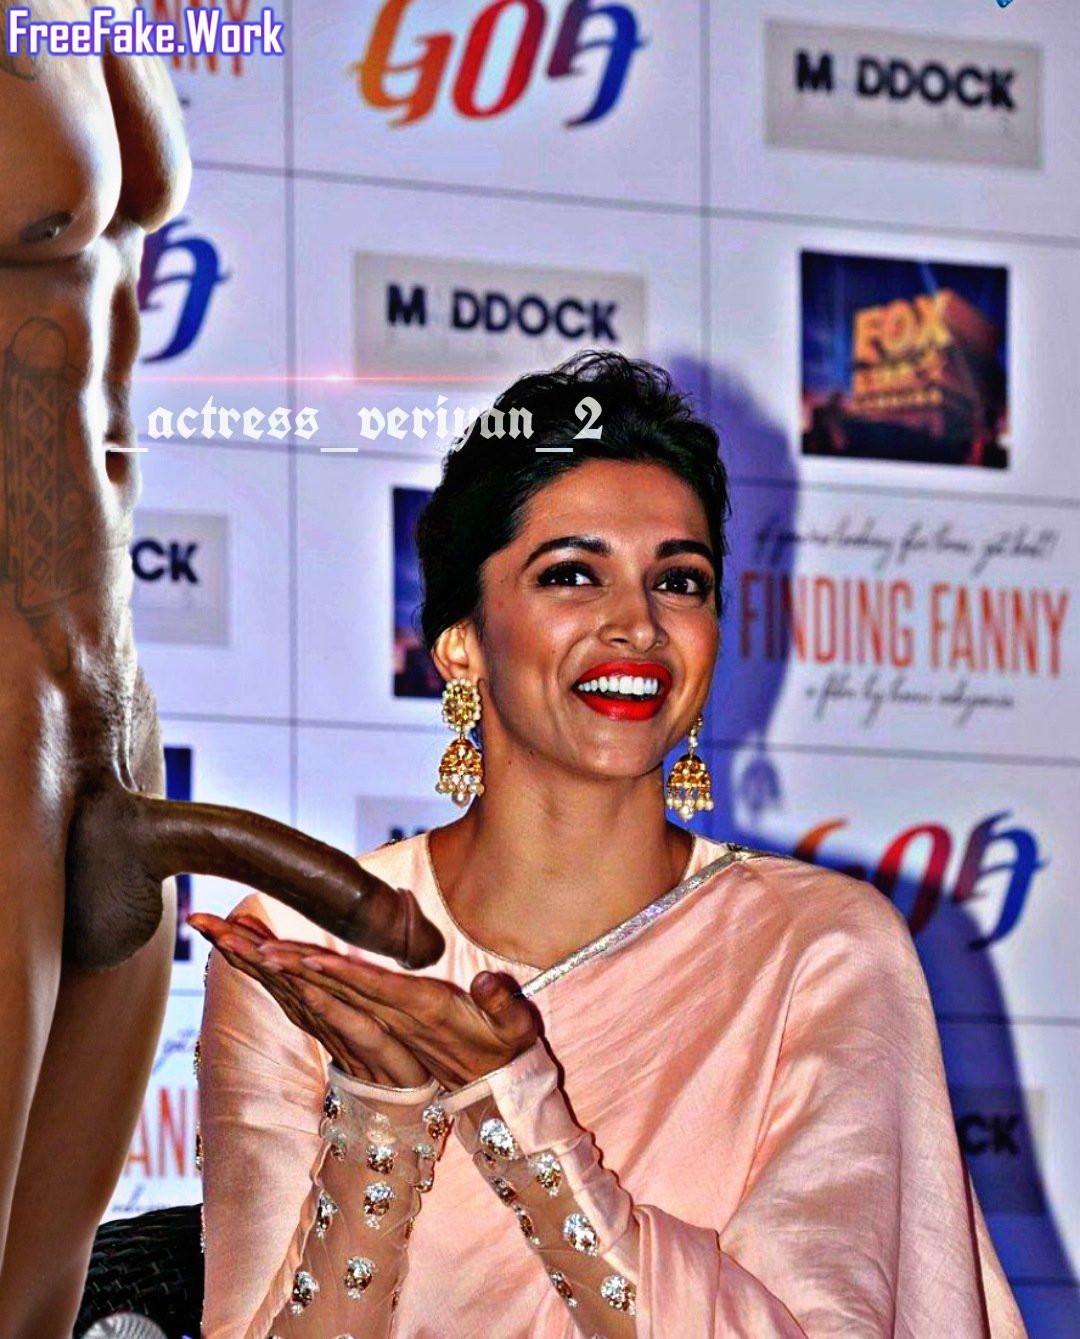 Big-black-cock-cum-on-Deepika-Padukone-hand.jpg